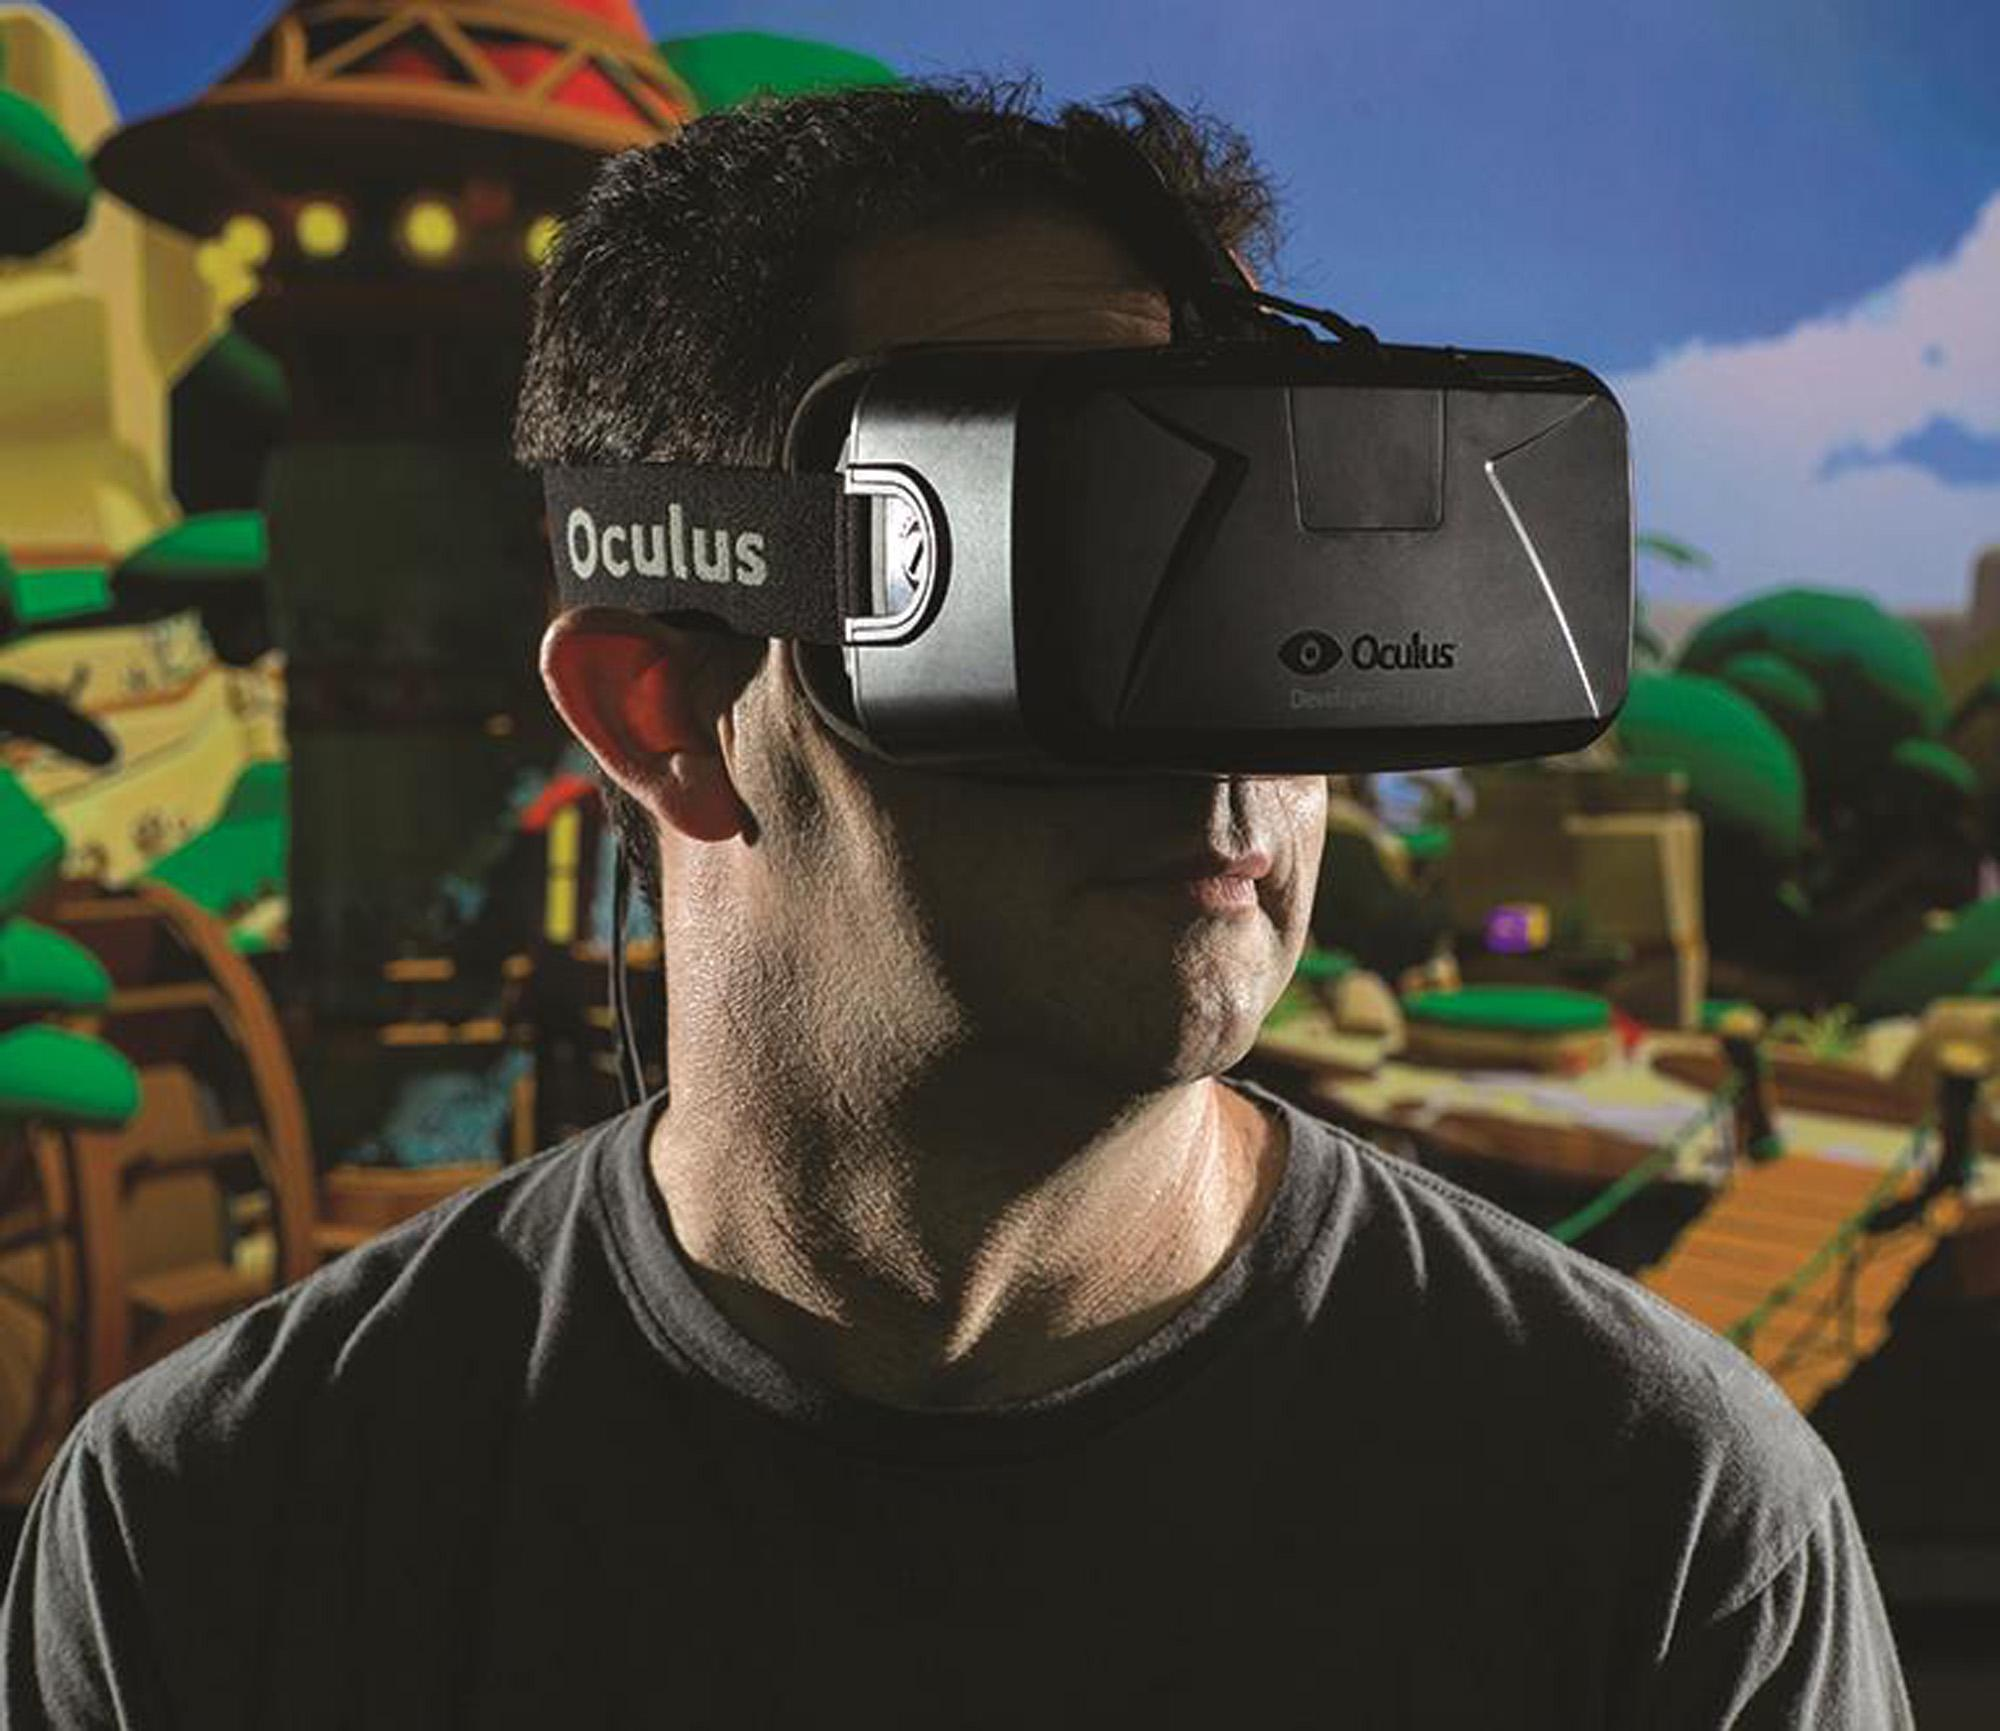 Professor Steve LaValle wears an Oculus Rift headset.